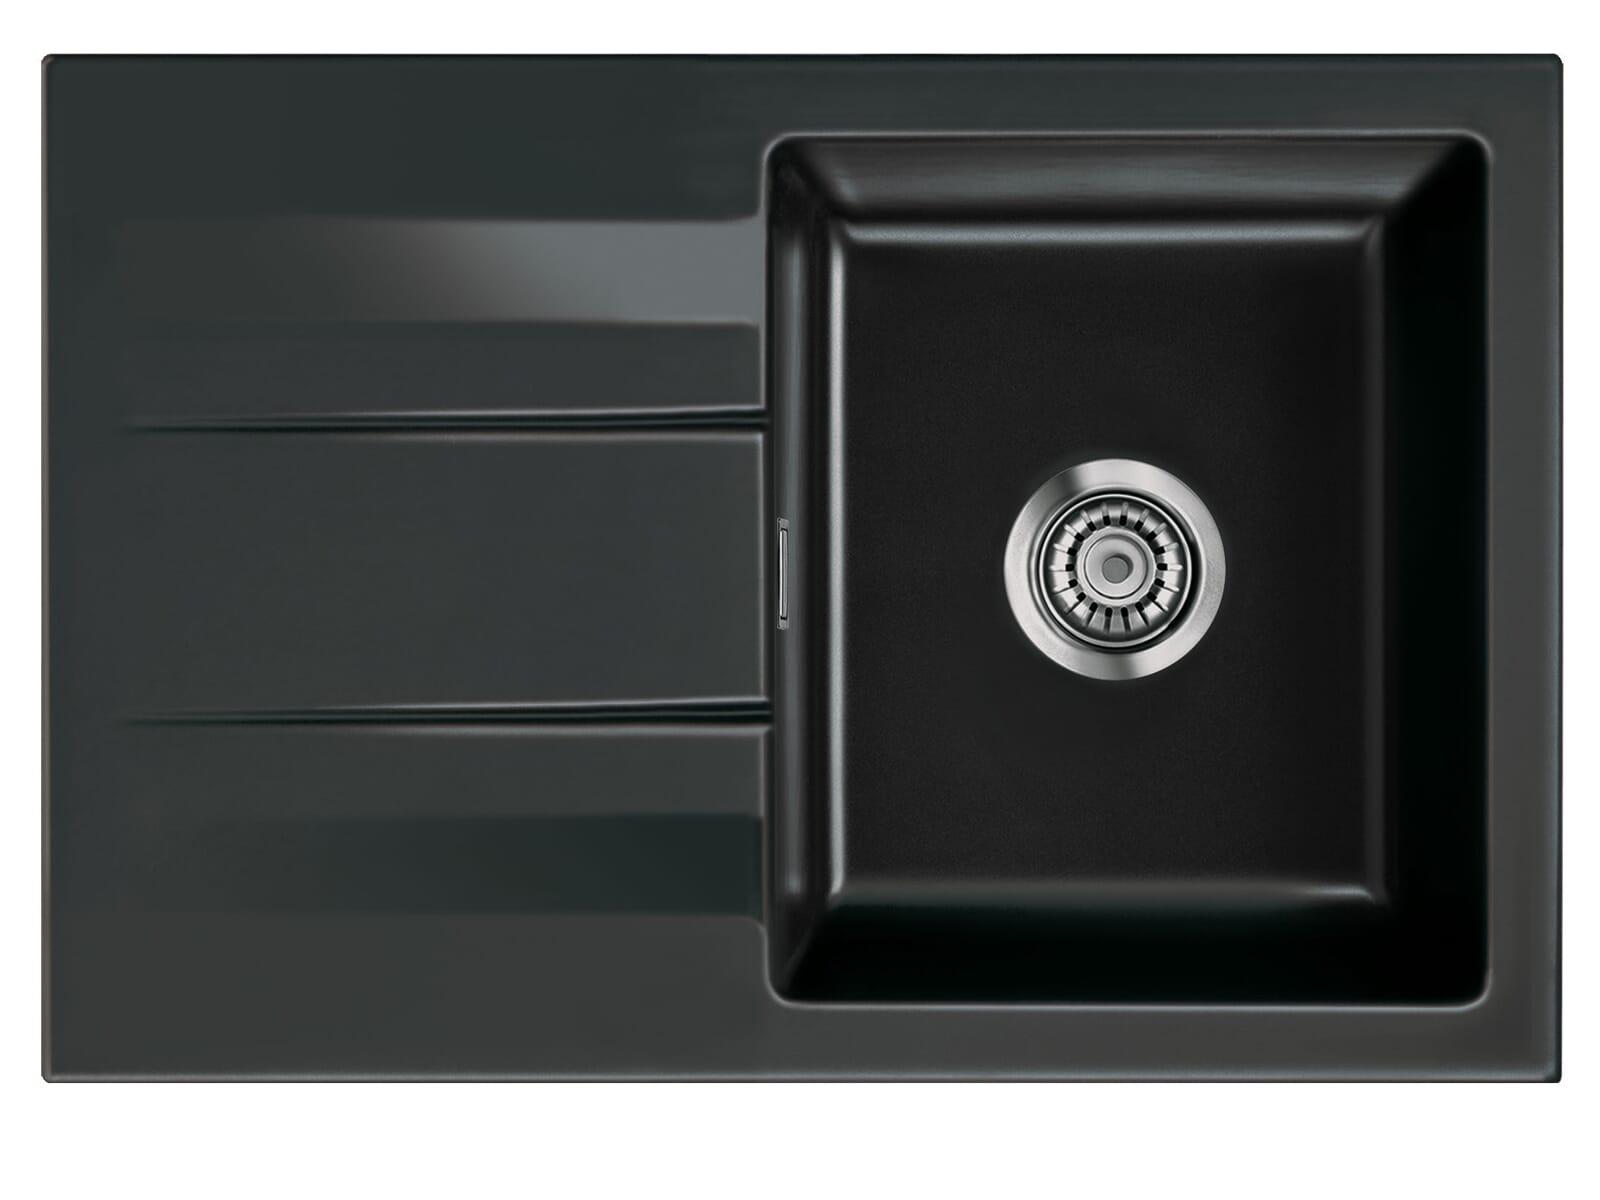 Systemceram Genea 75 Nero Keramikspüle Handbetätigung